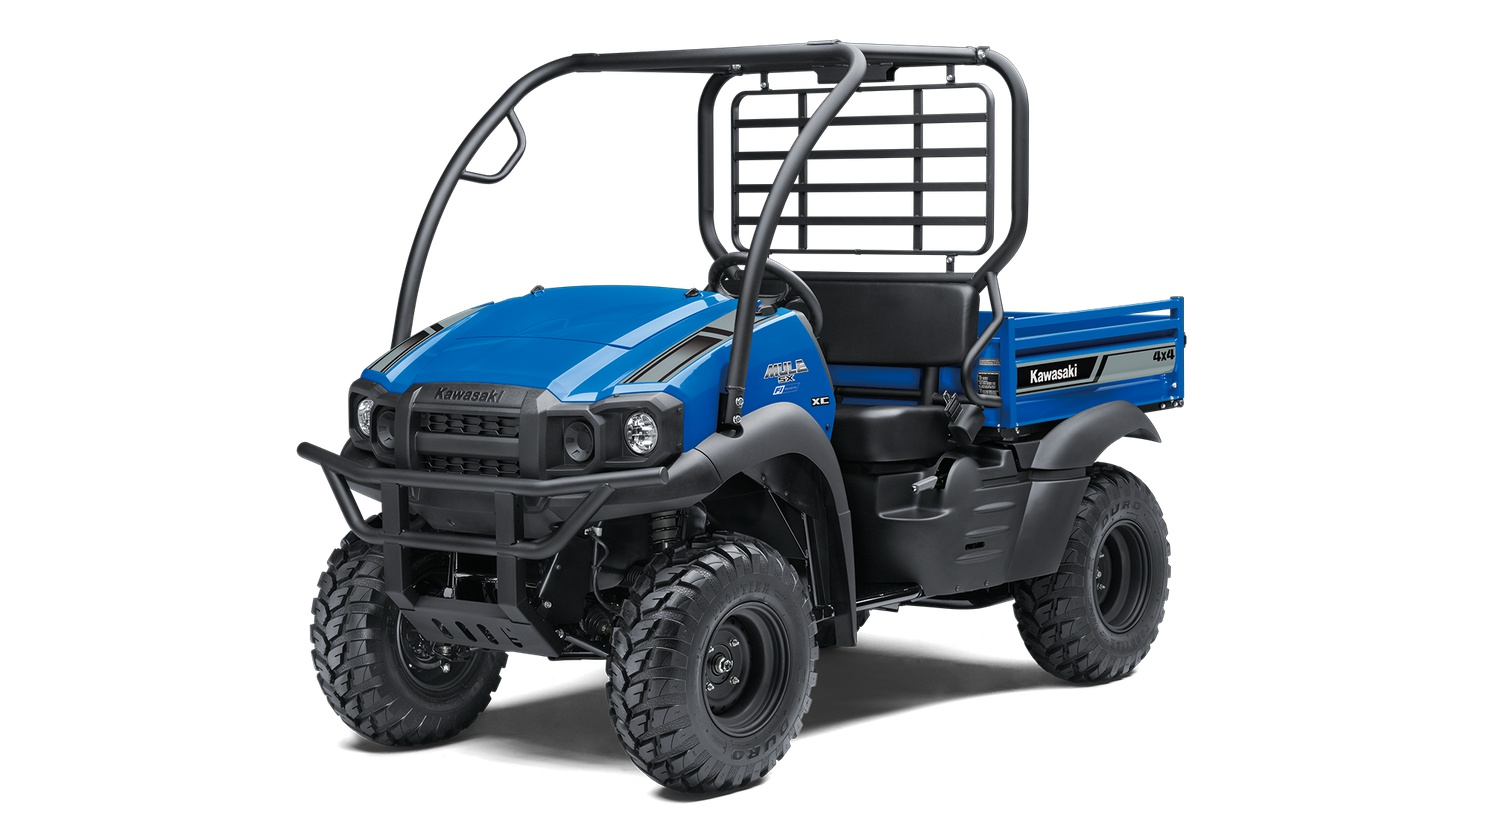 2020 Kawasaki MULE SX 4x4 XC FI Vibrant Blue